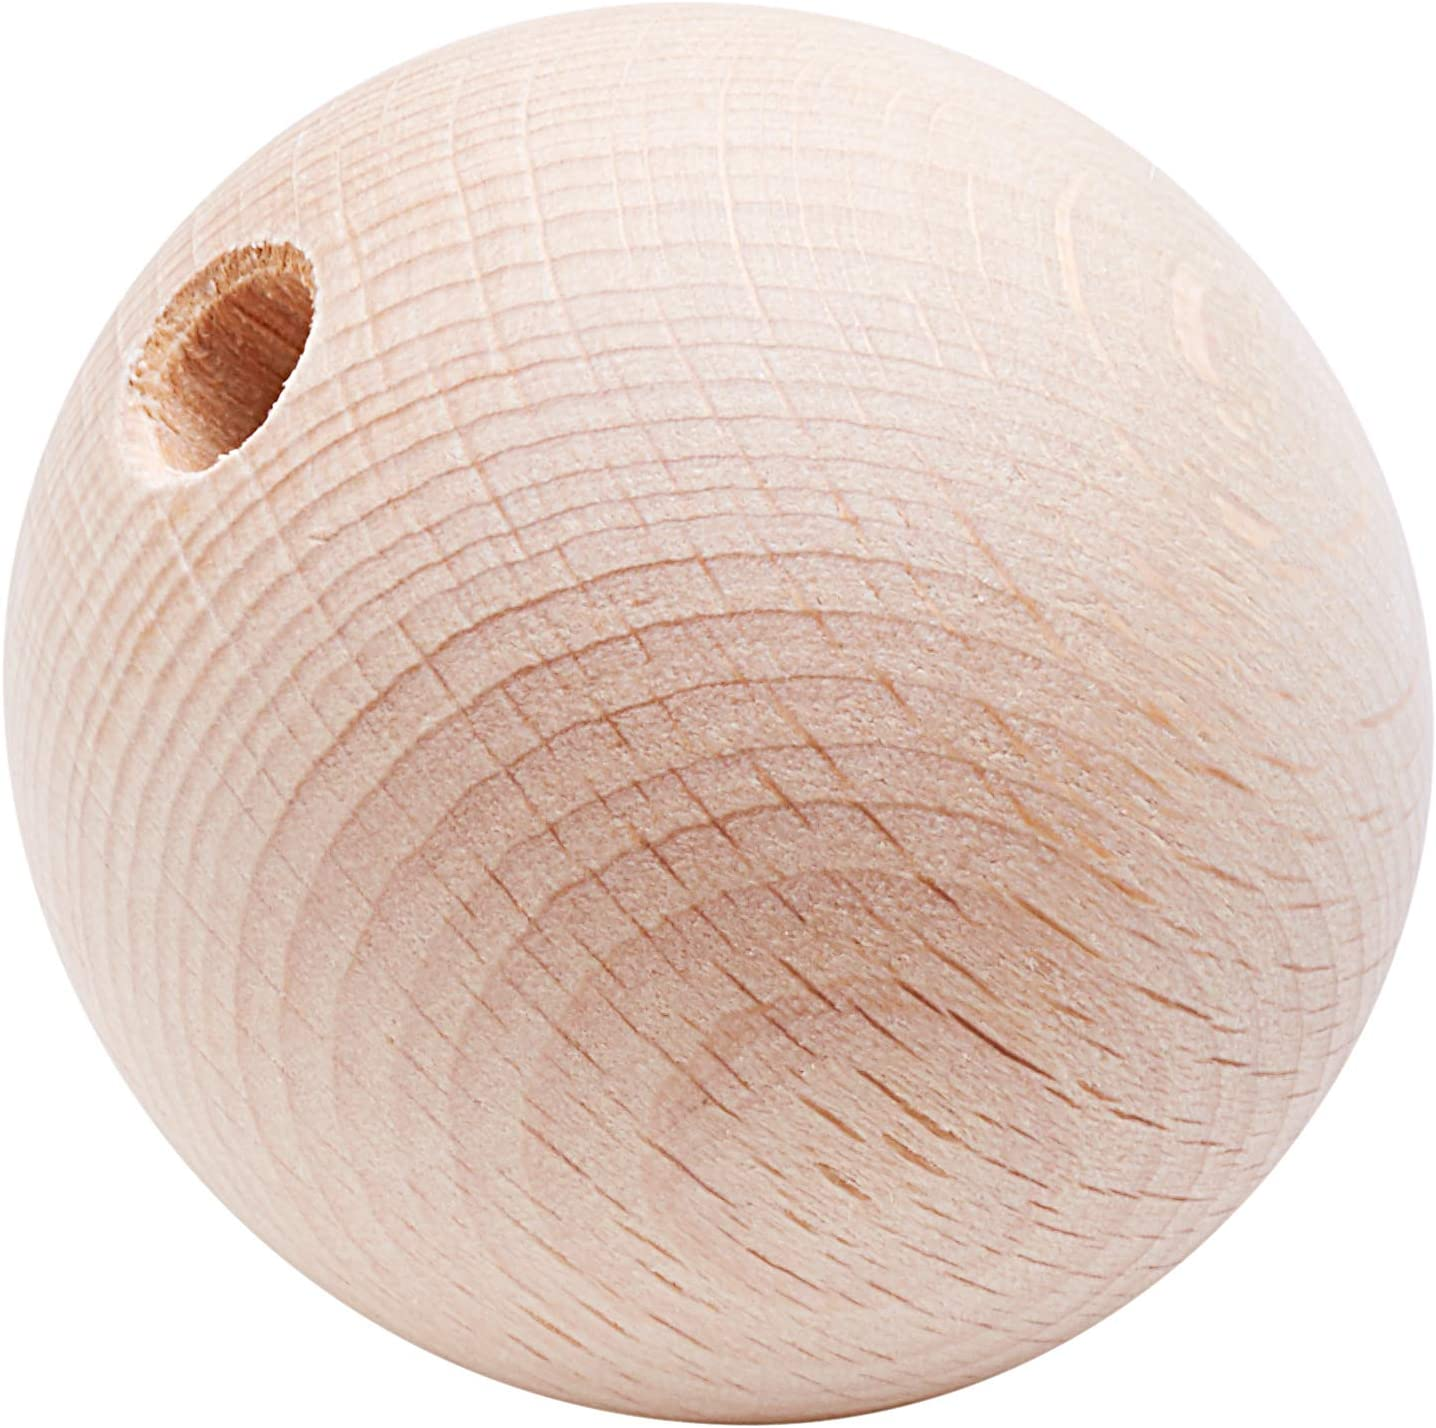 Perle en bois Ø 40 mm Boule demi-percée Ø 8 mm Rayher